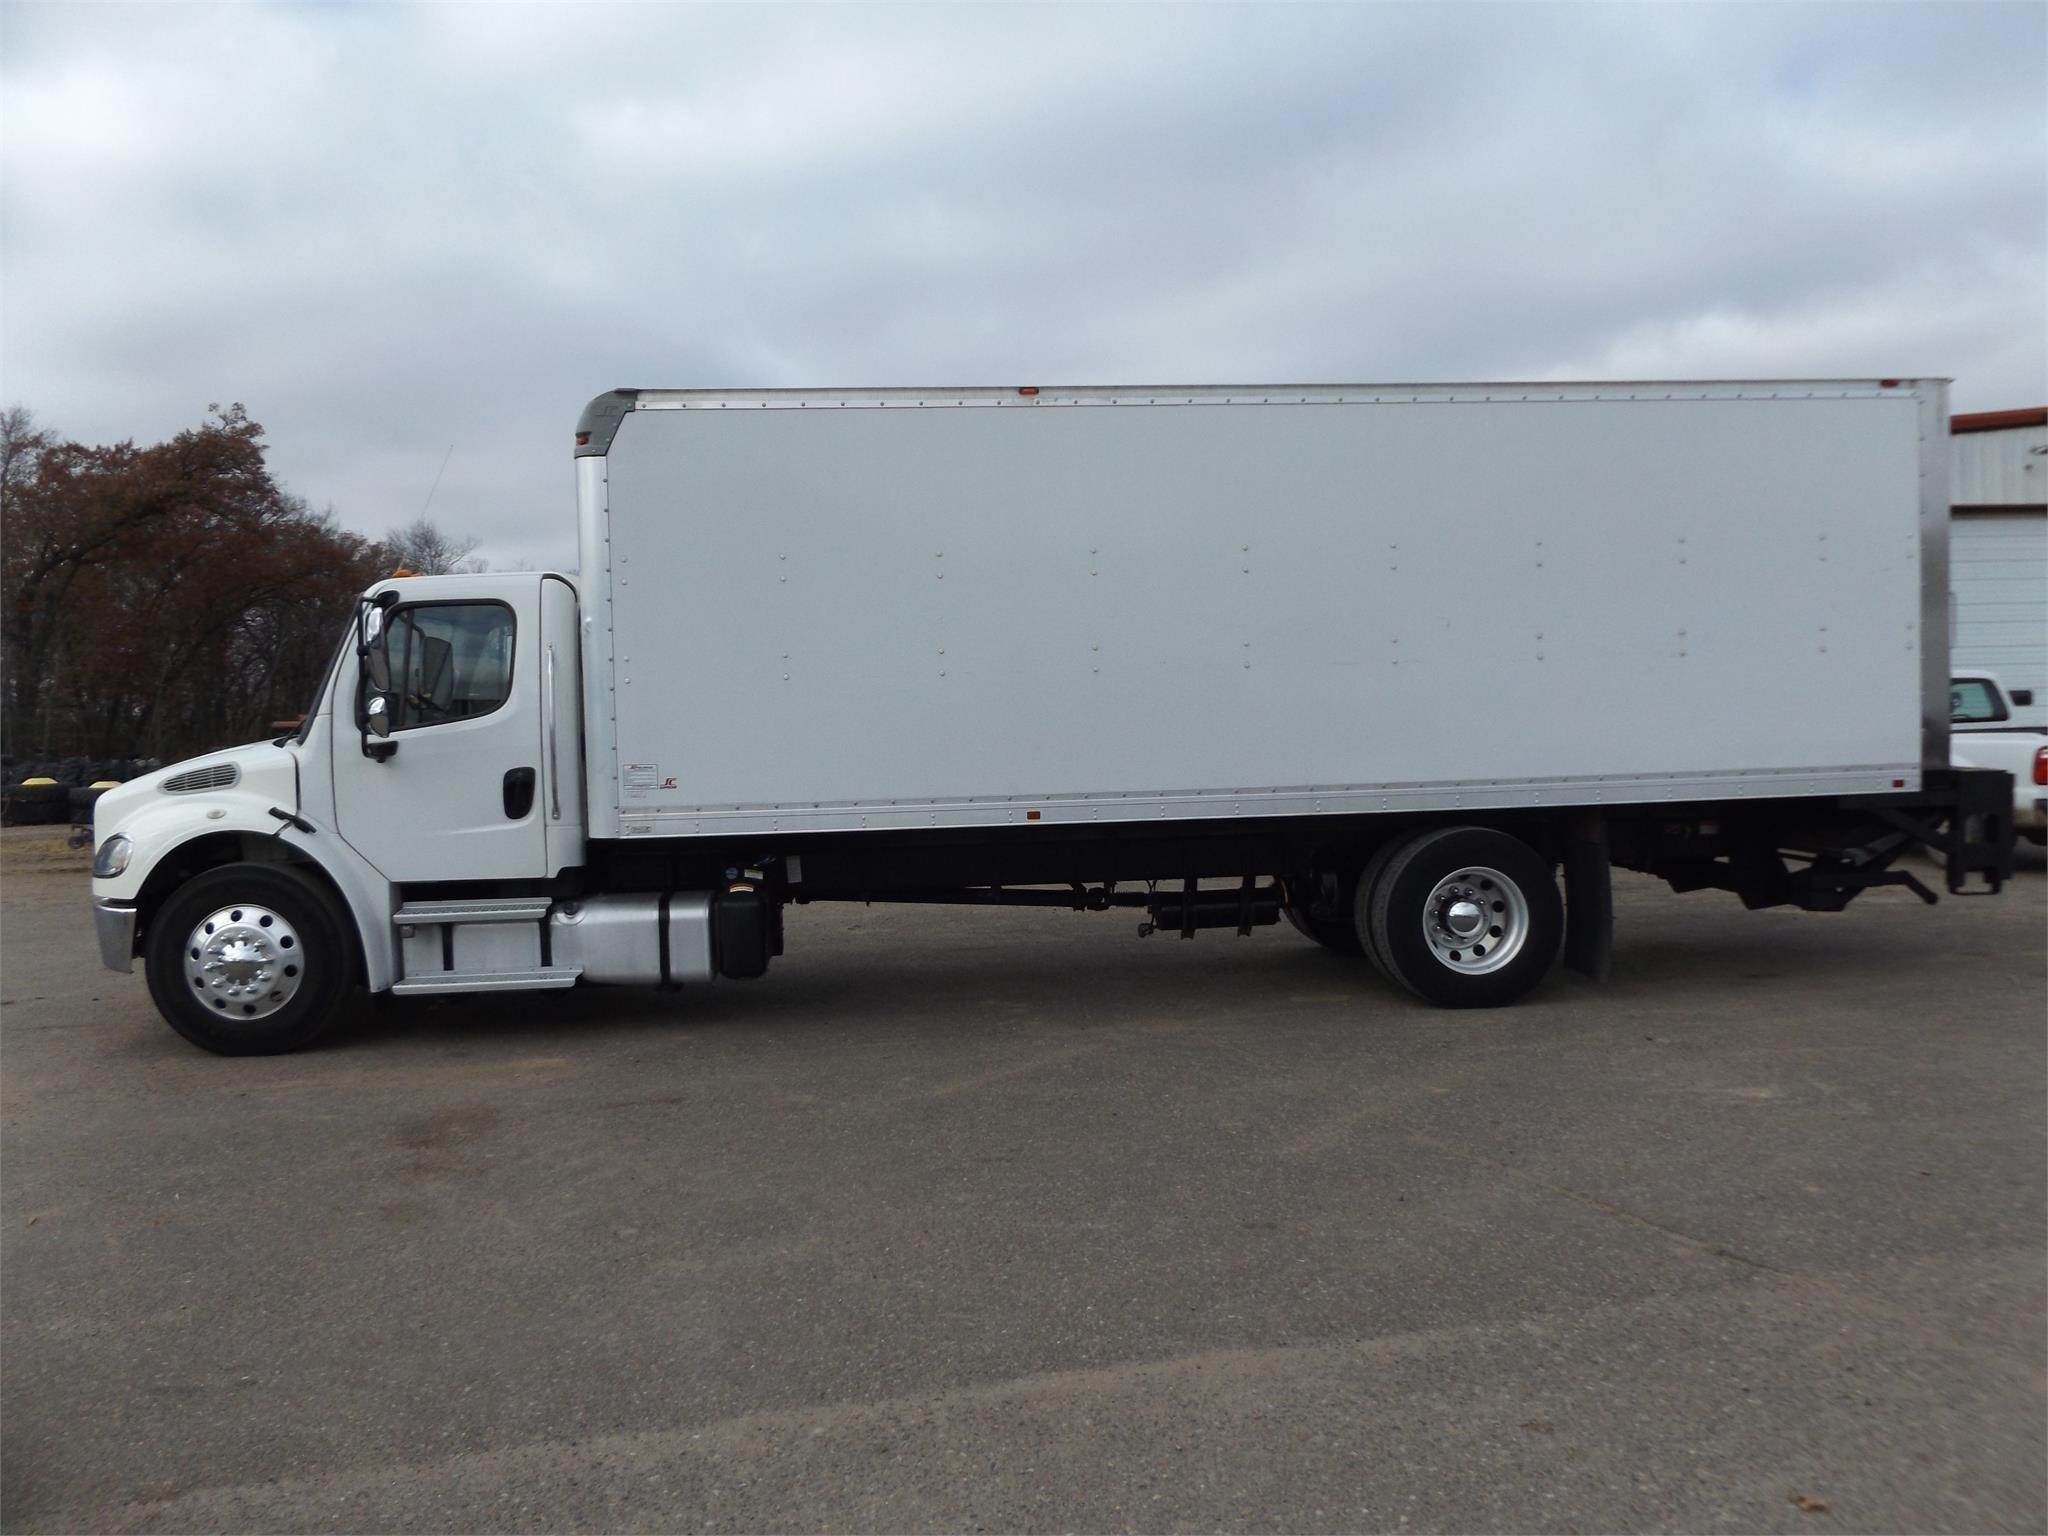 2015 Freightliner BUSINESS CLASS M2 106 Semi Truck